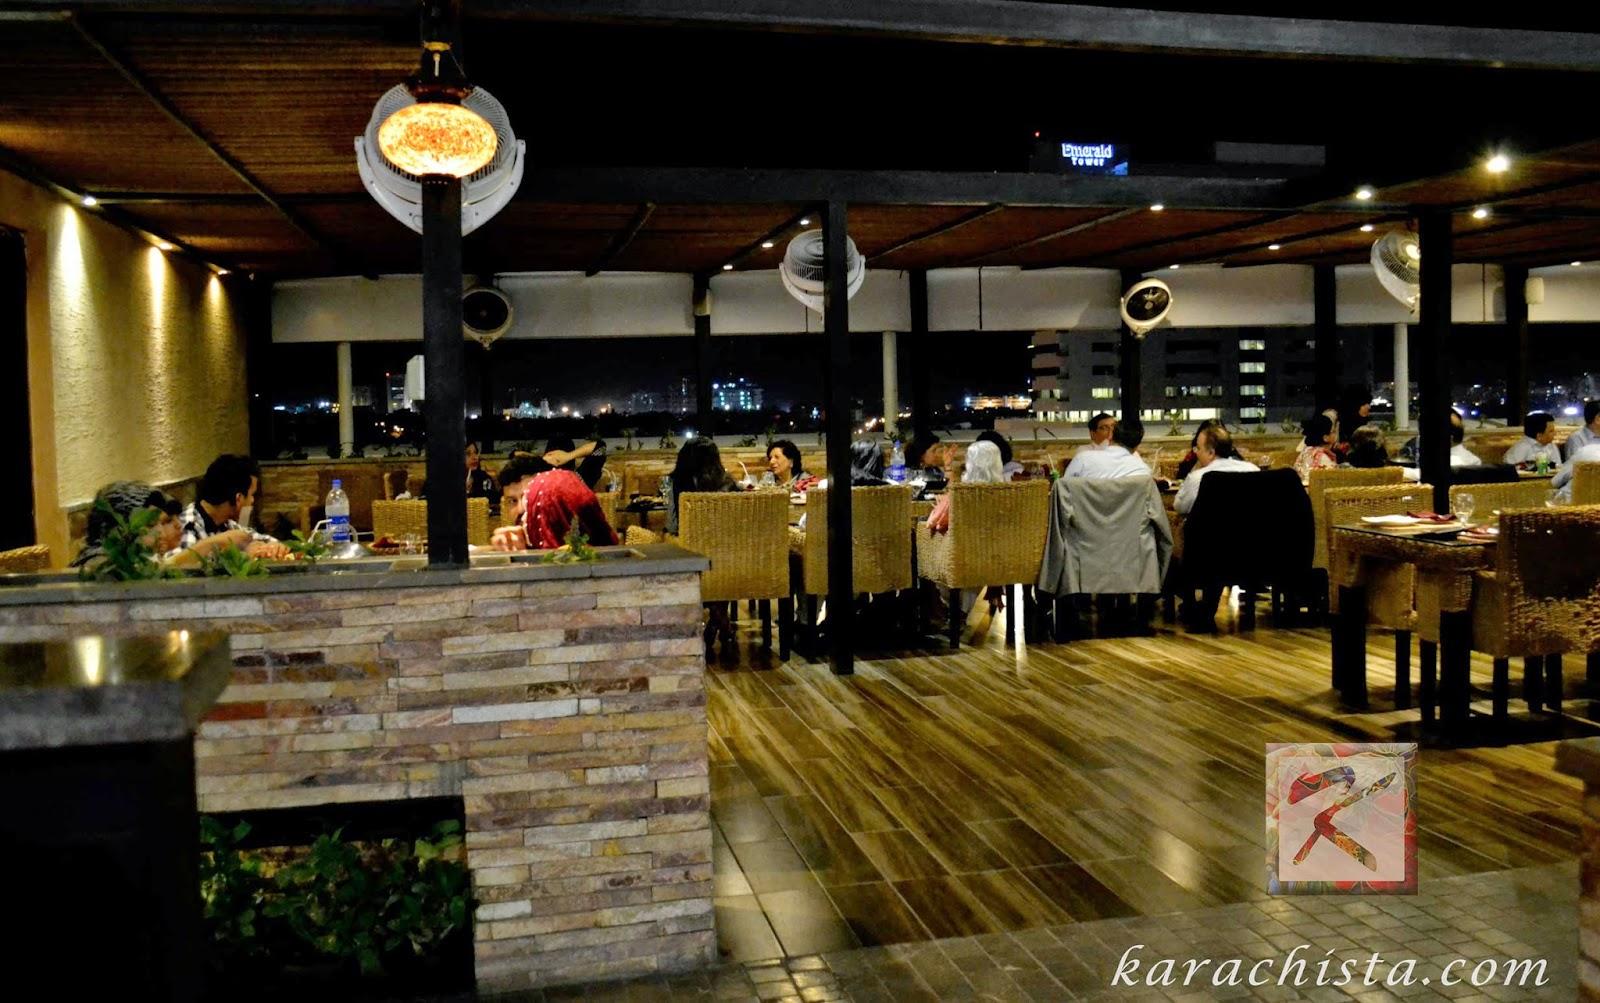 Ocean Grill - Zameer Ansari's upscale branch at Ocean Mall